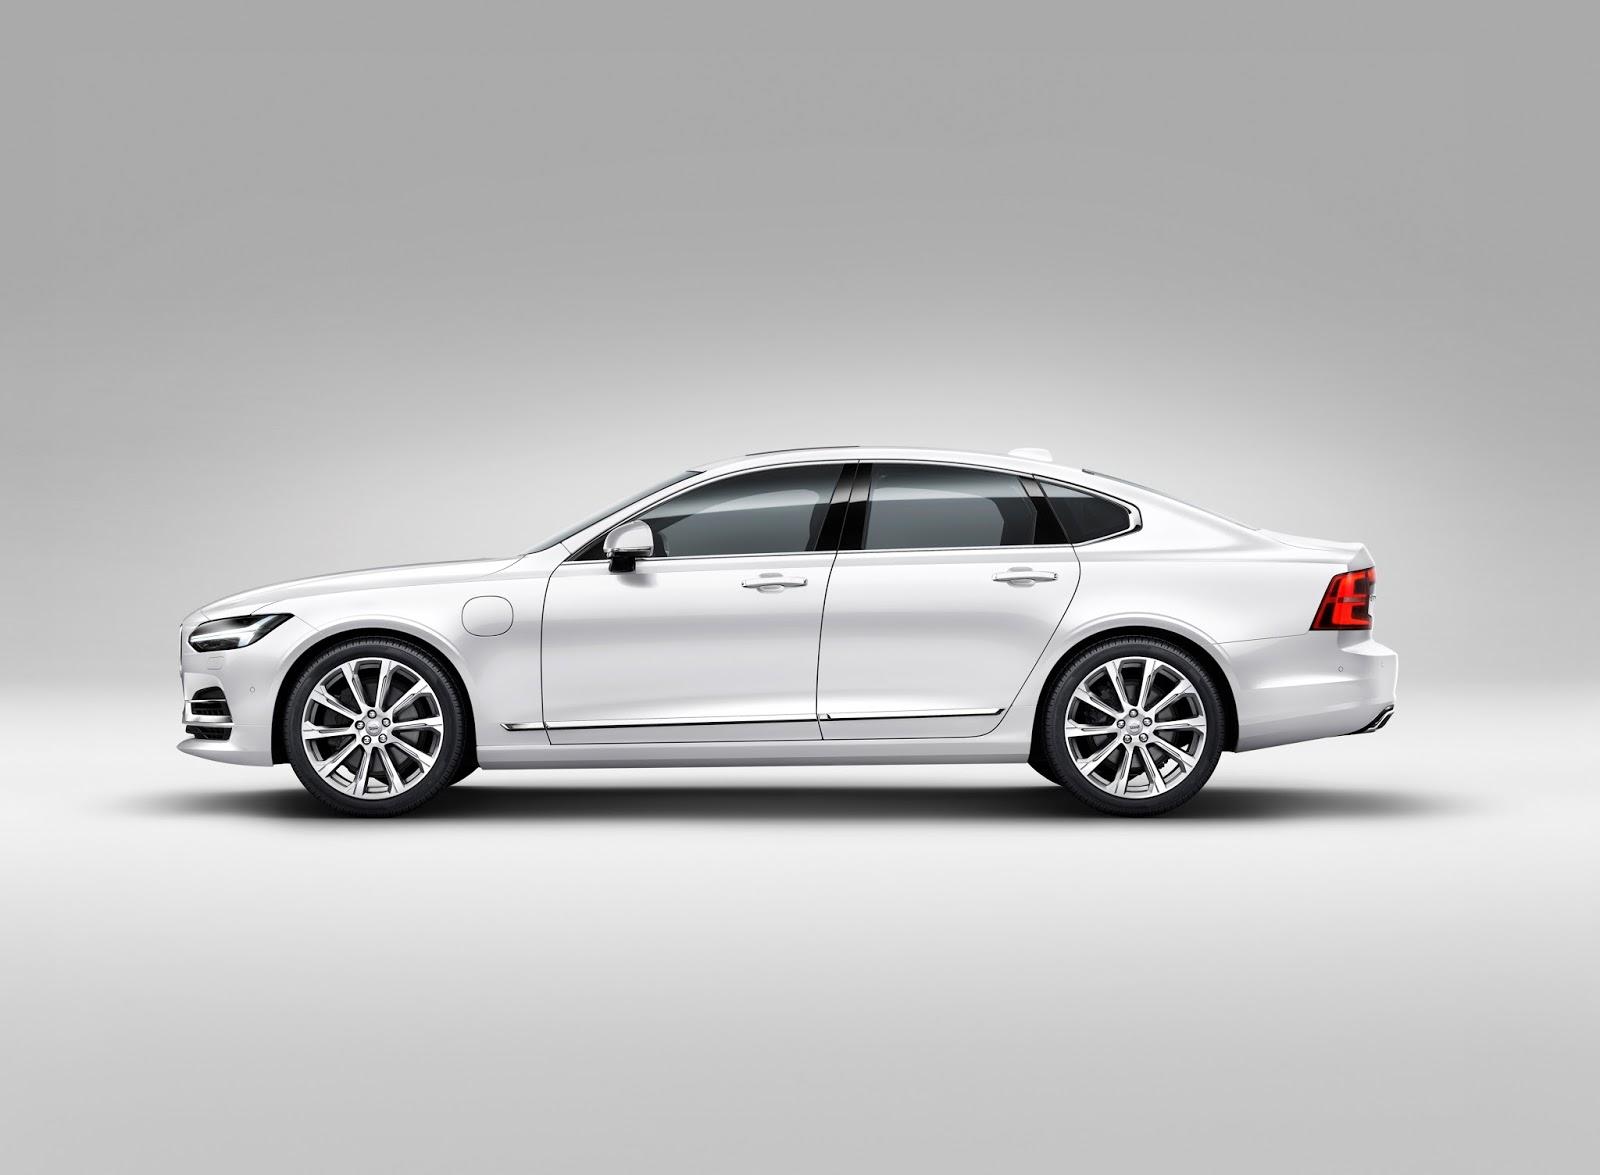 170146 Profile Left Volvo S90 White Το νέο Volvo S90 έρχεται και βάζει φωτιά στον ανταγωνισμό premium sedan, Volvo, Volvo Cars, Volvo S90